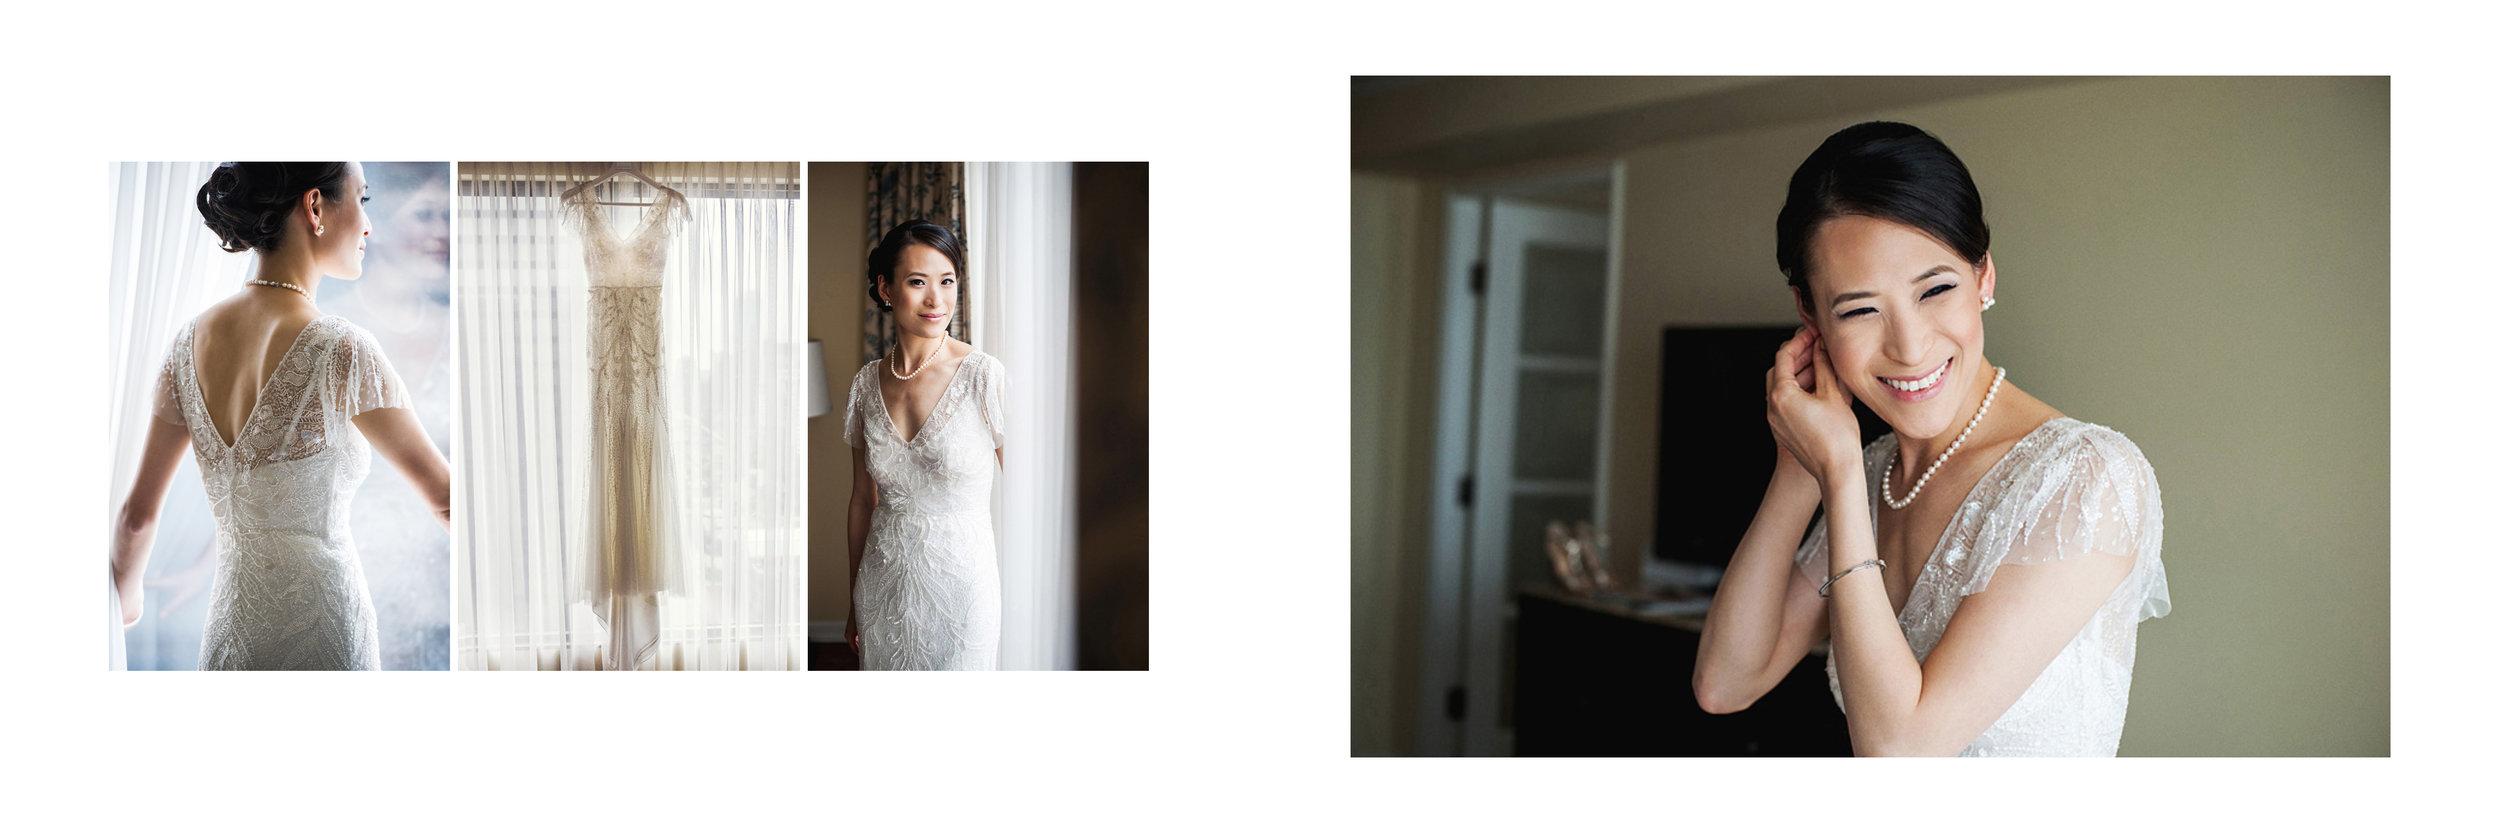 Andrea-Reuben-Grouse-Mountain-Wedding-Real-Weddings-Feature-Yaletown-Photography-003.jpg